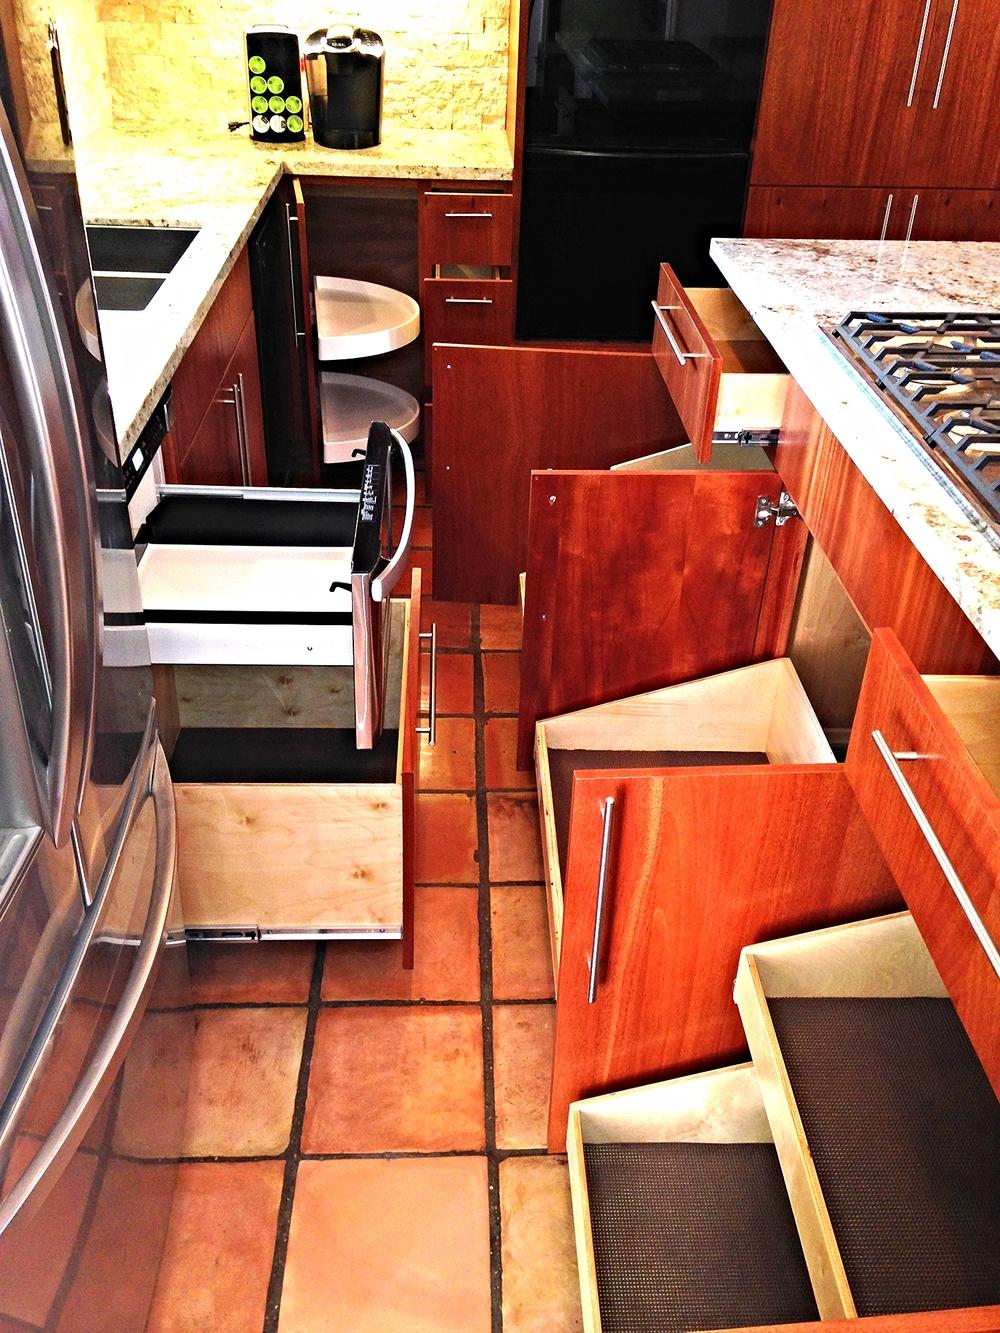 Bukolt kitchen remodel view nine